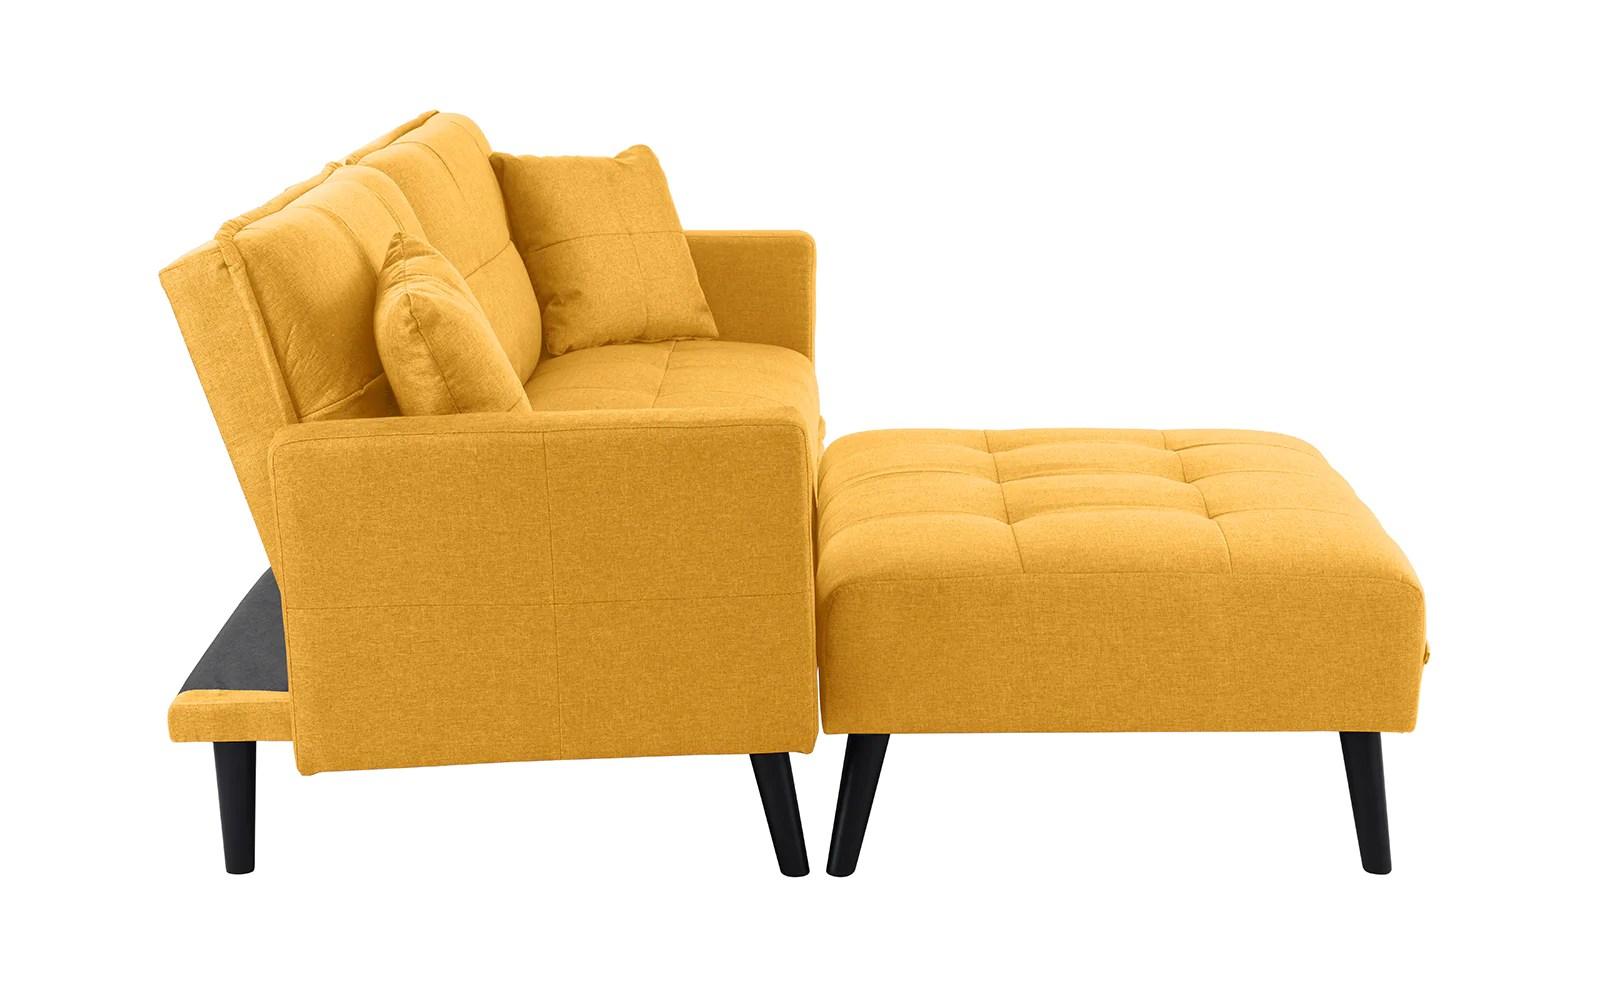 berwick mid century sleeper sofa set bangalore madison linen sofamania